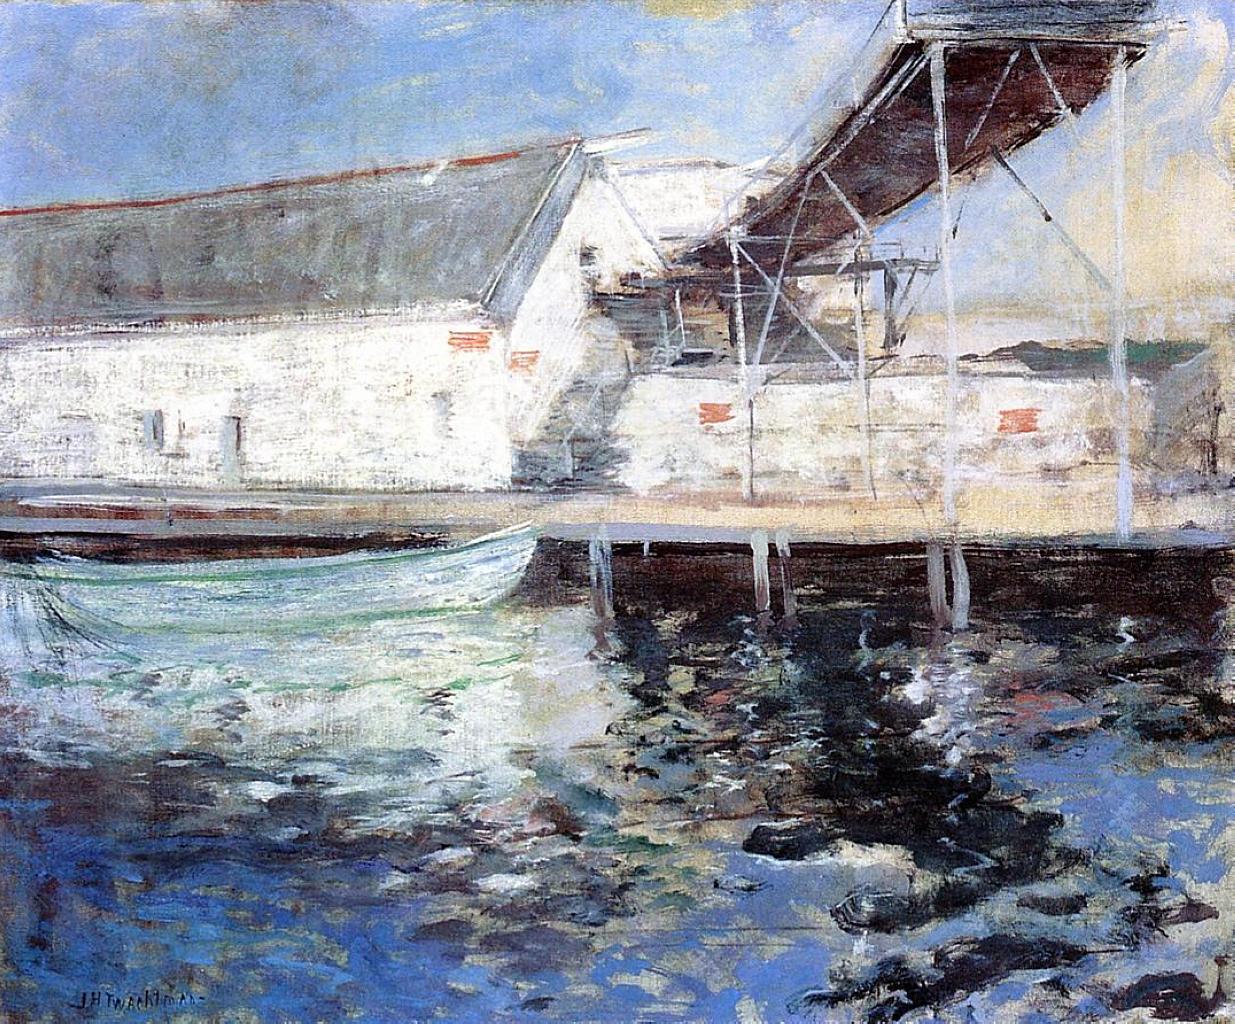 Fish Sheds, Gloucester, Massachusetts, 1900-1902